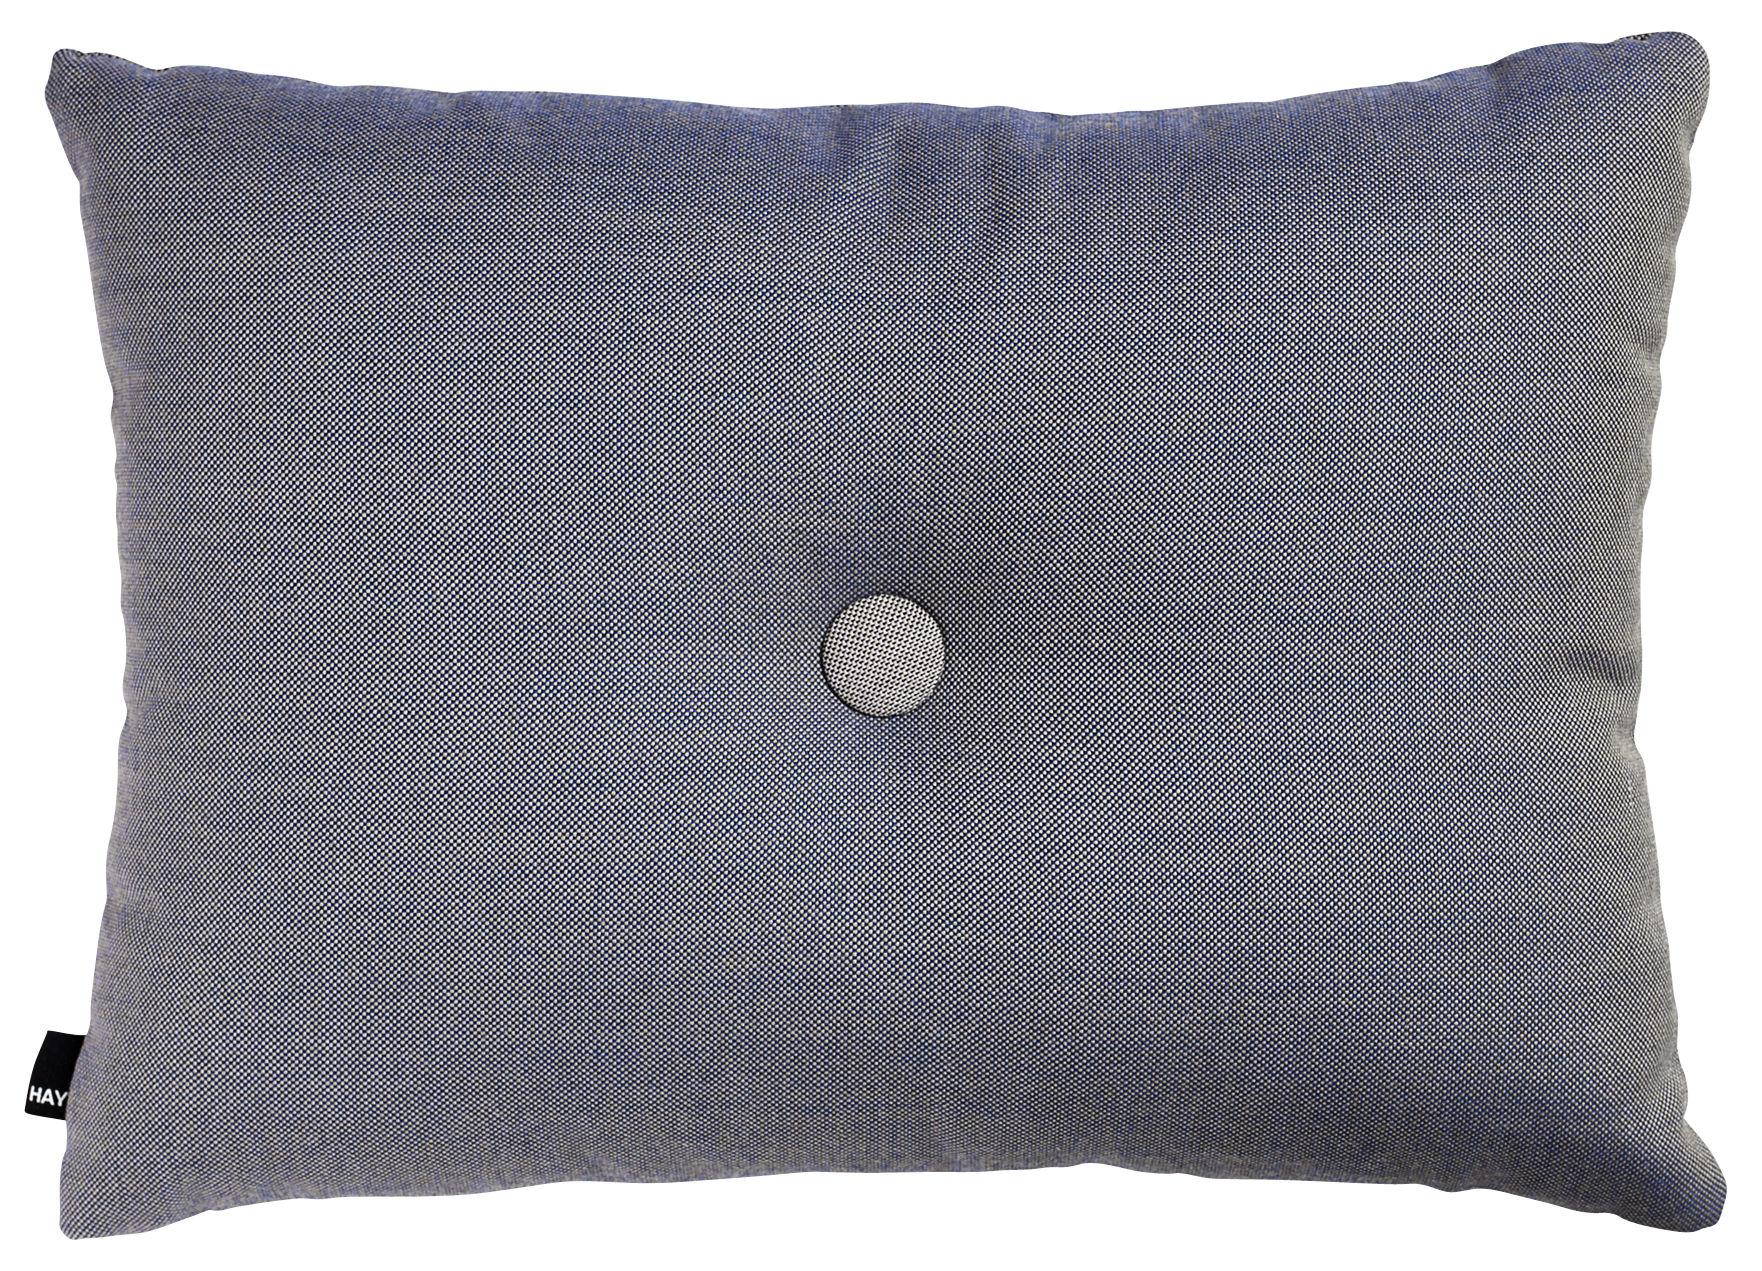 Decoration - Cushions & Poufs - Dot - Surface Cushion - 60 x 45 cm by Hay - Steel blue - Kvadrat fabric